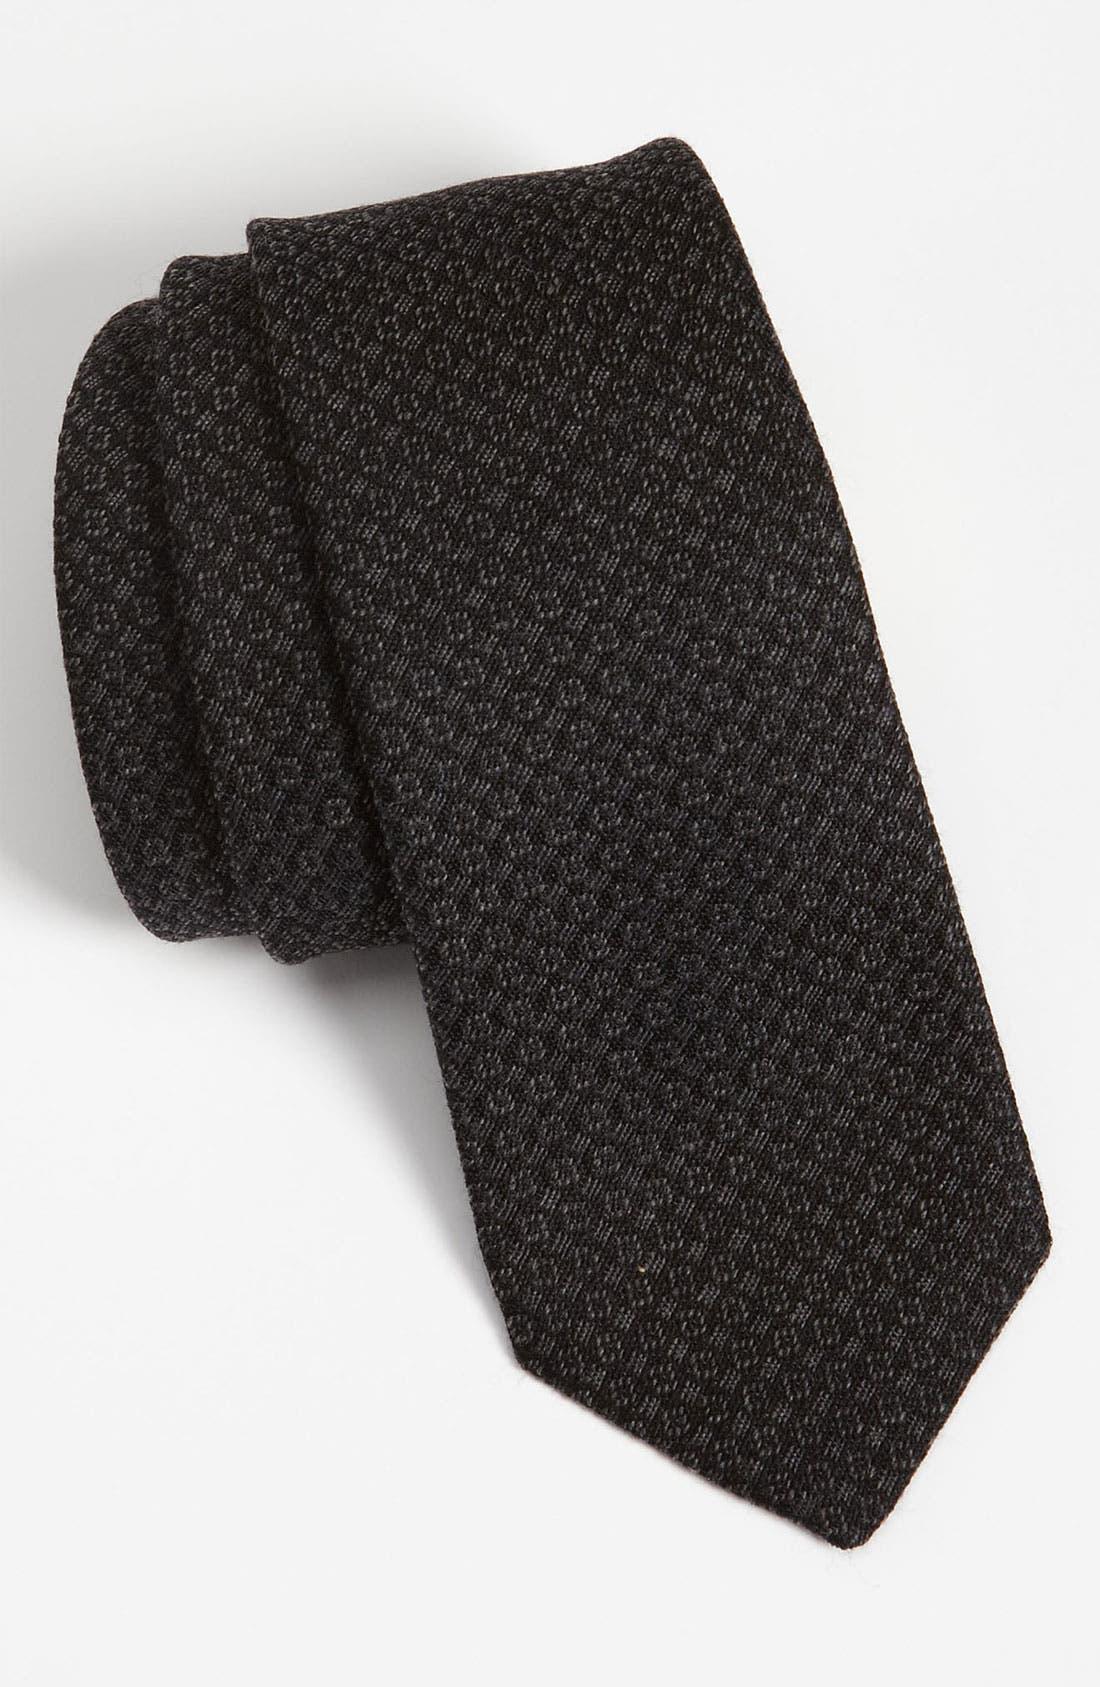 Main Image - Burberry London Wool Blend Tie